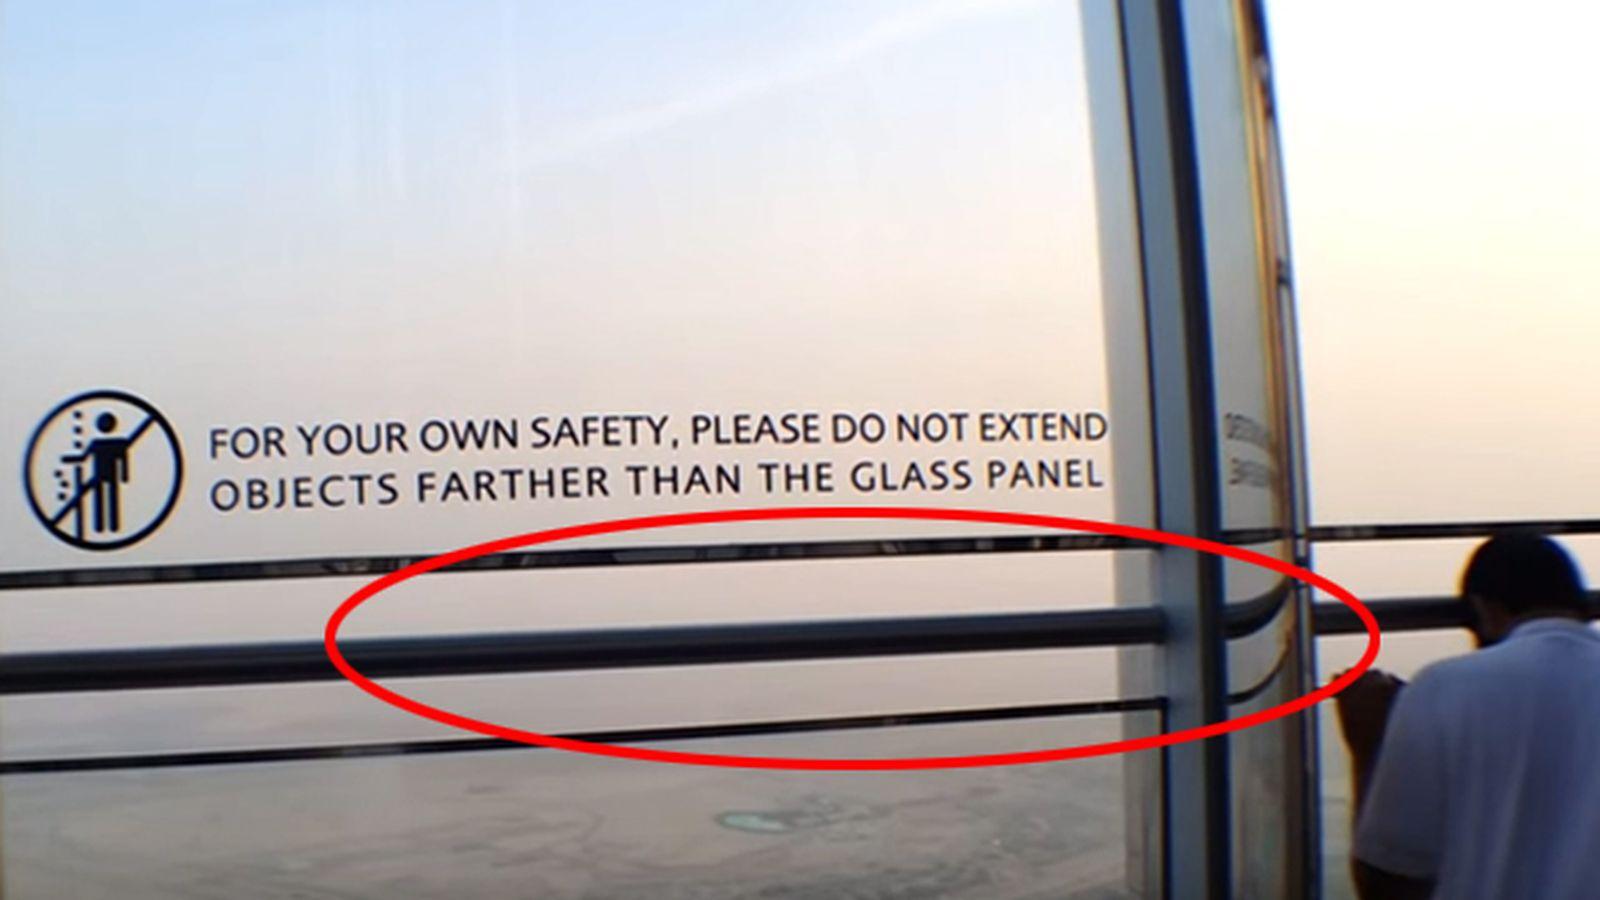 Laura Vanessa Nunes_Suicide at the Burj Khalifa_Laura's Voice Whispers from an Angel_Leona Sykes___media_Images_2017_1511_nunes_burj_khalifa_bar